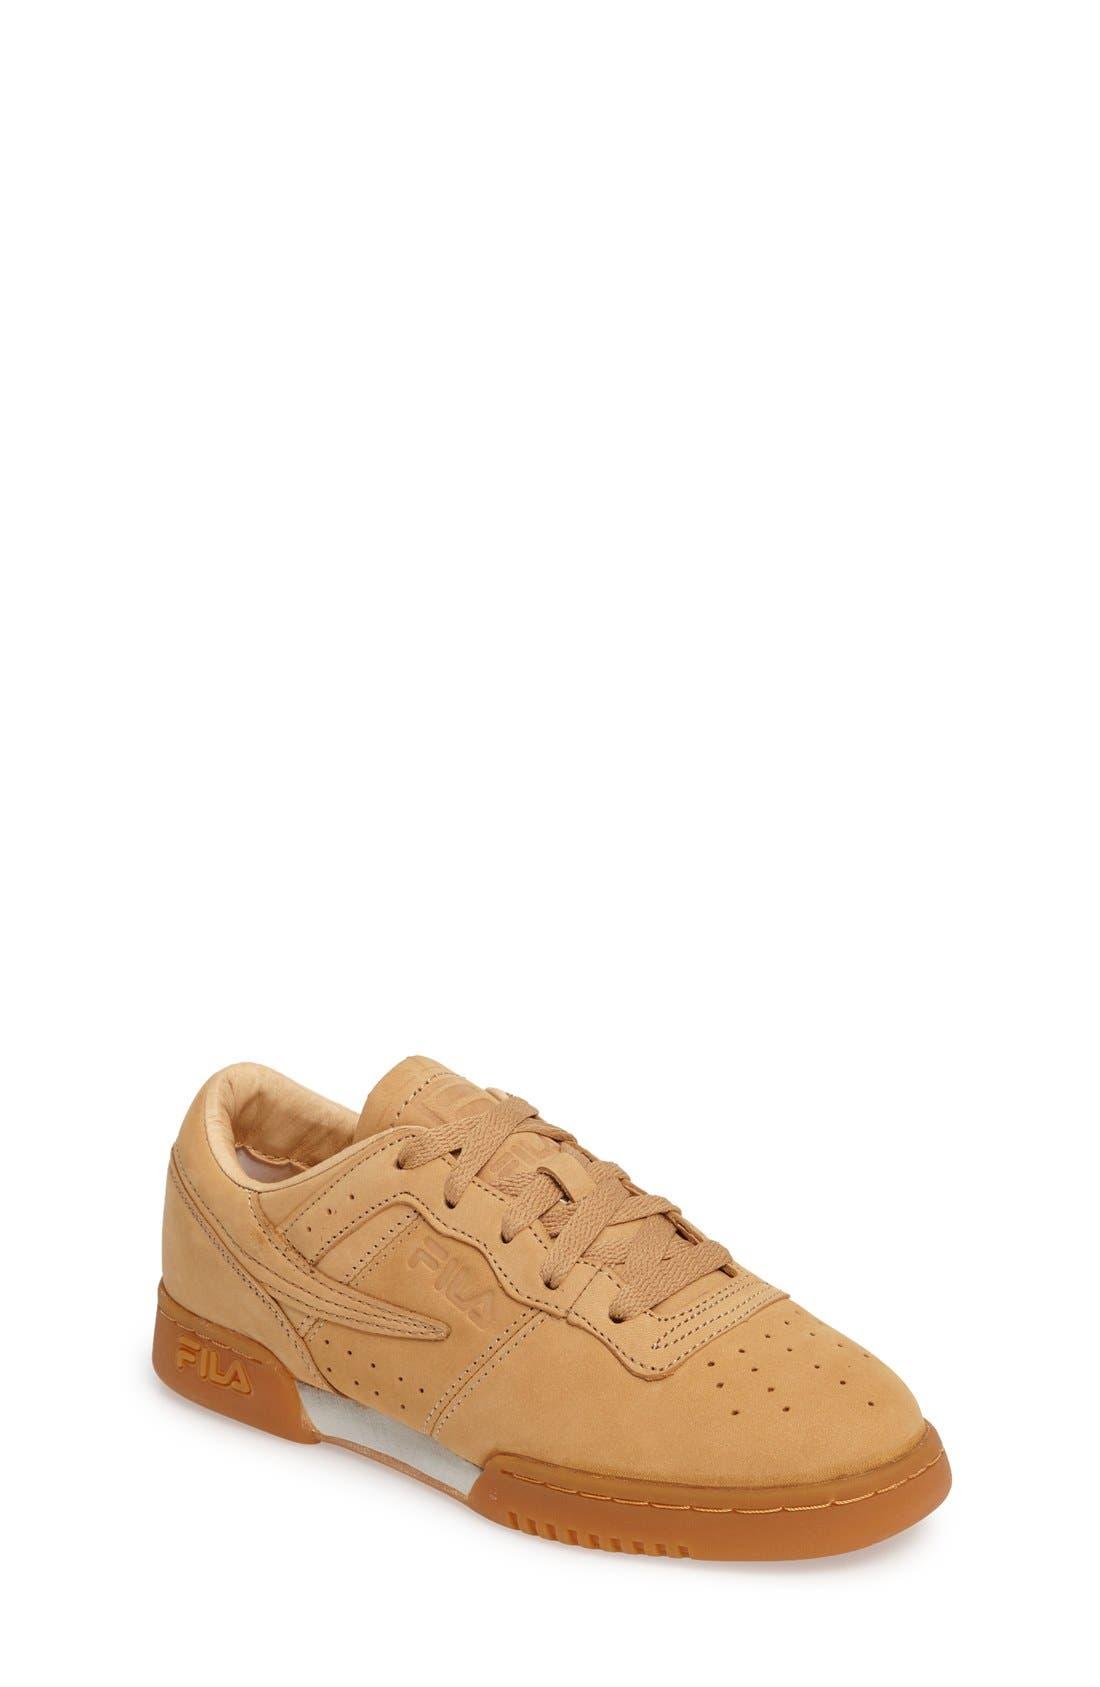 FILA USA Heritage Sneaker